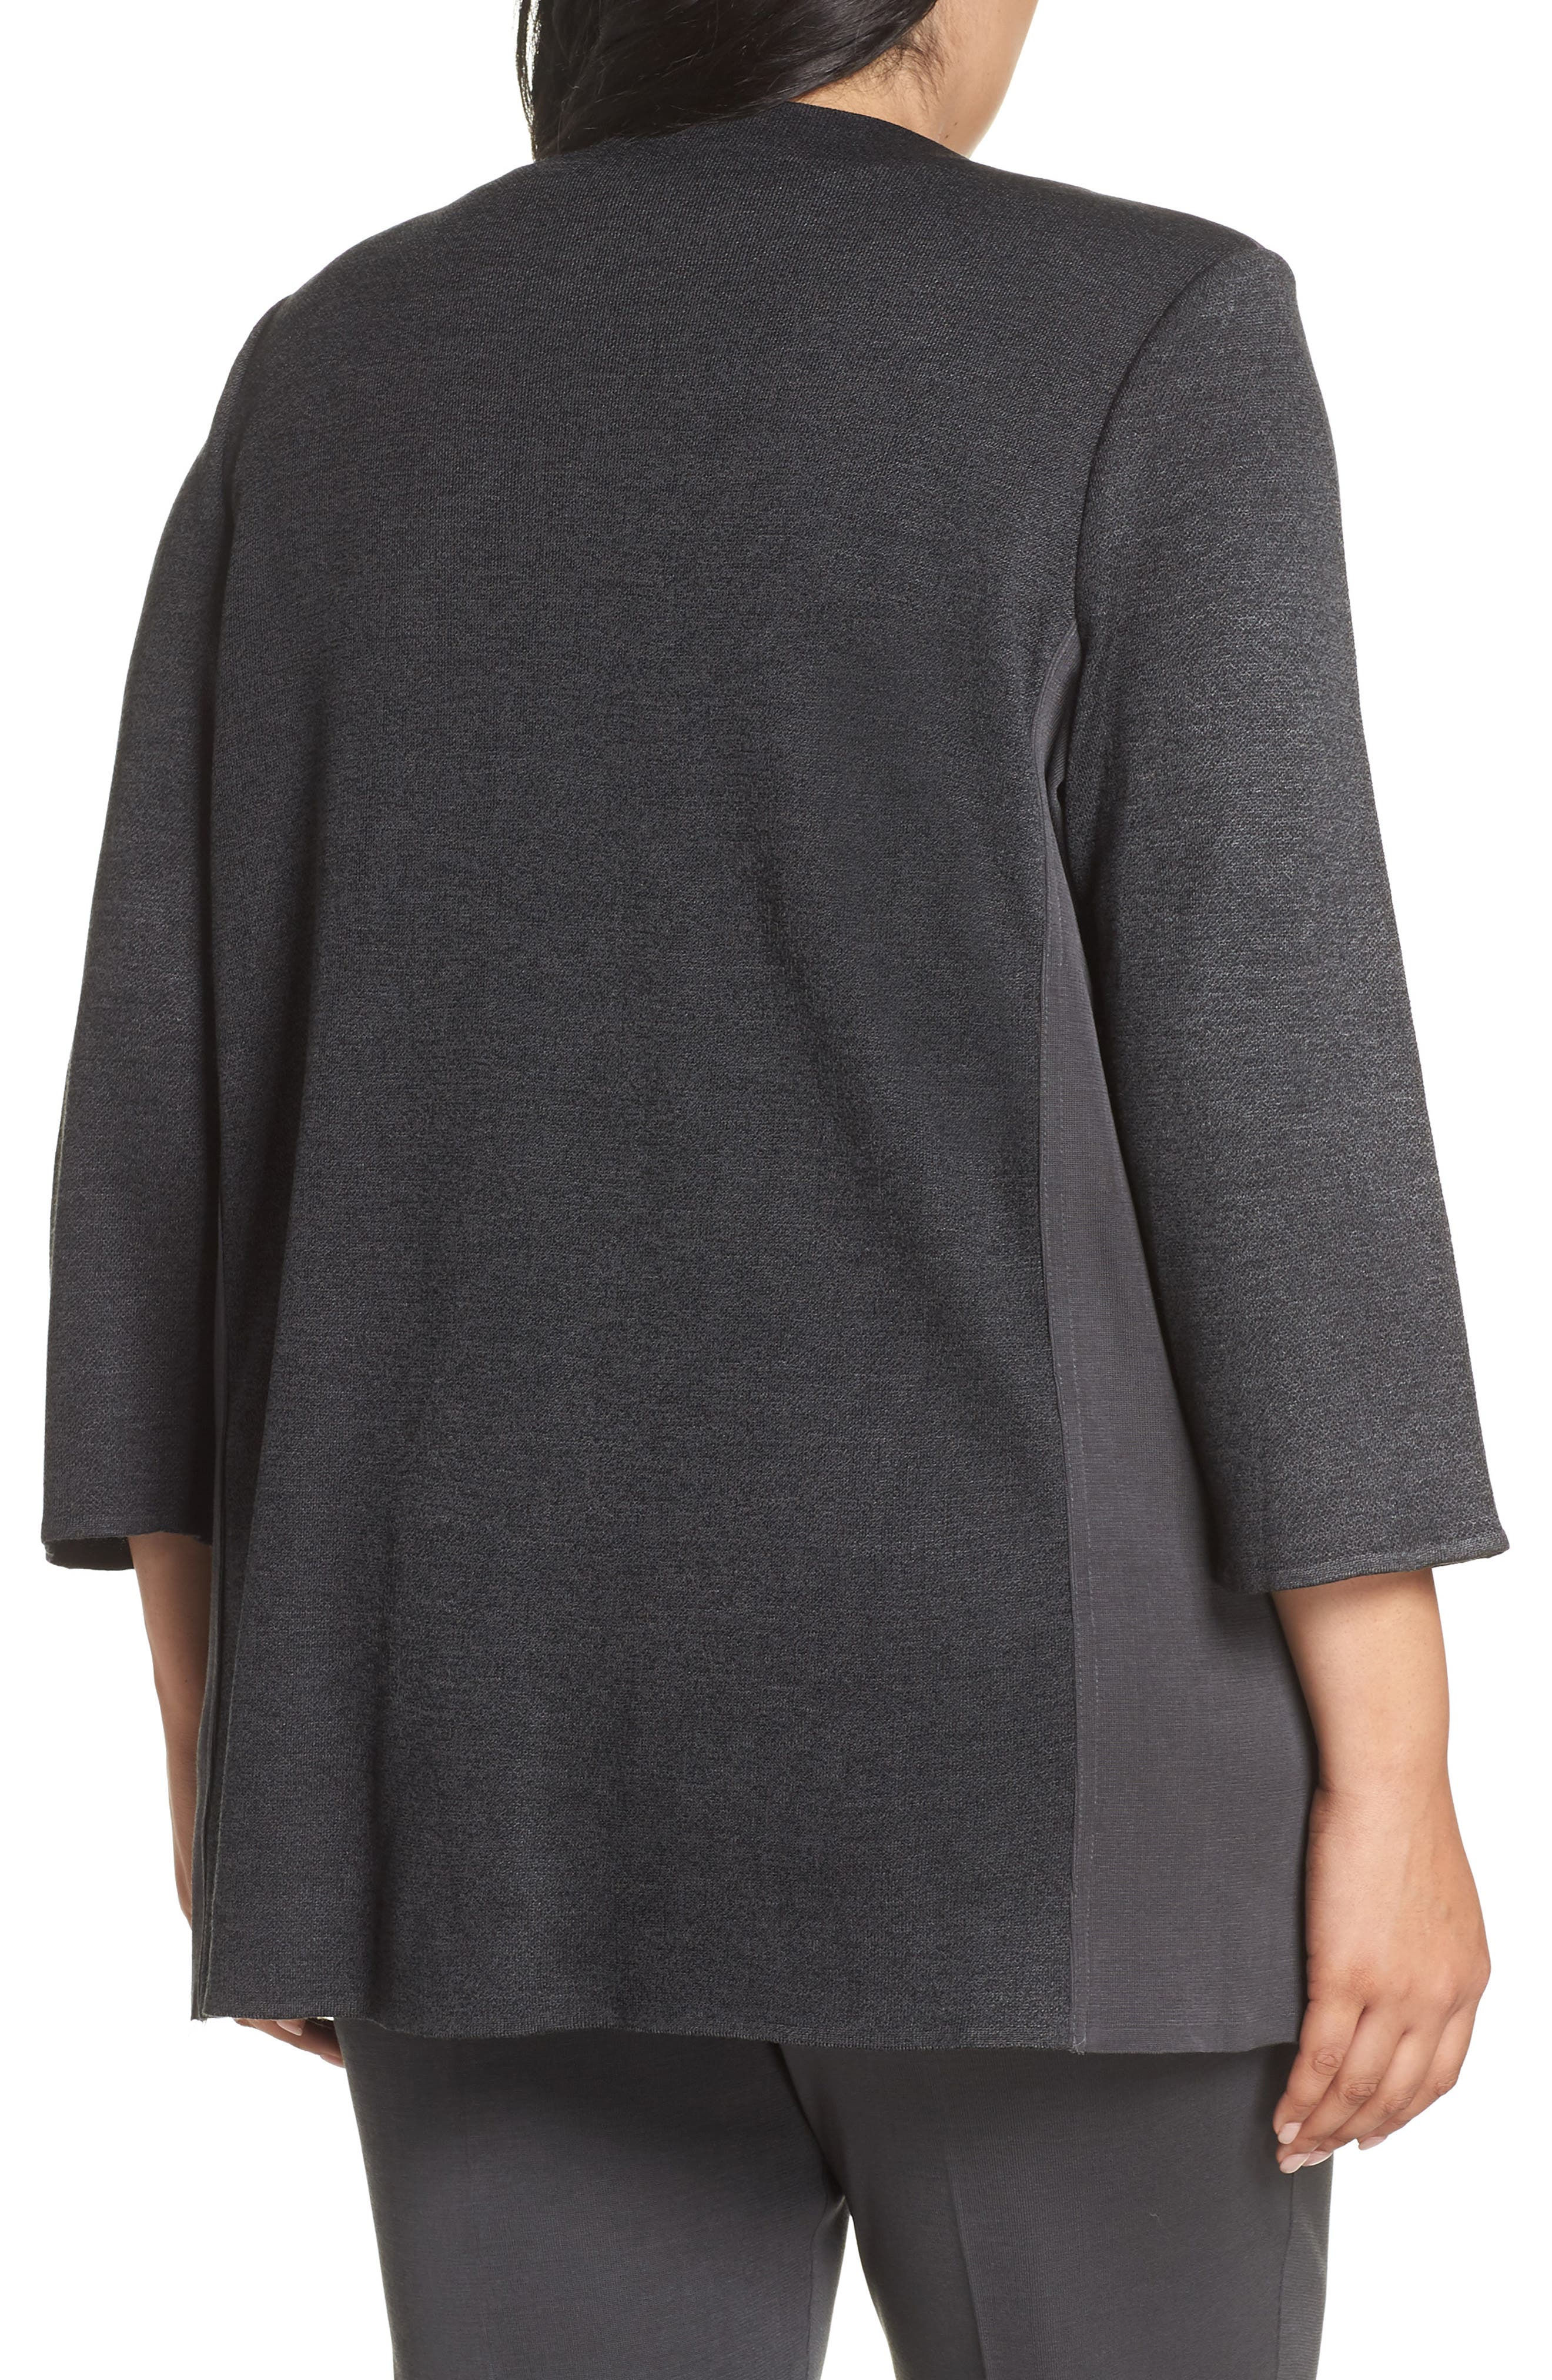 MING WANG, Colorblock Knit Jacket, Alternate thumbnail 2, color, BLACK/ GRANITE